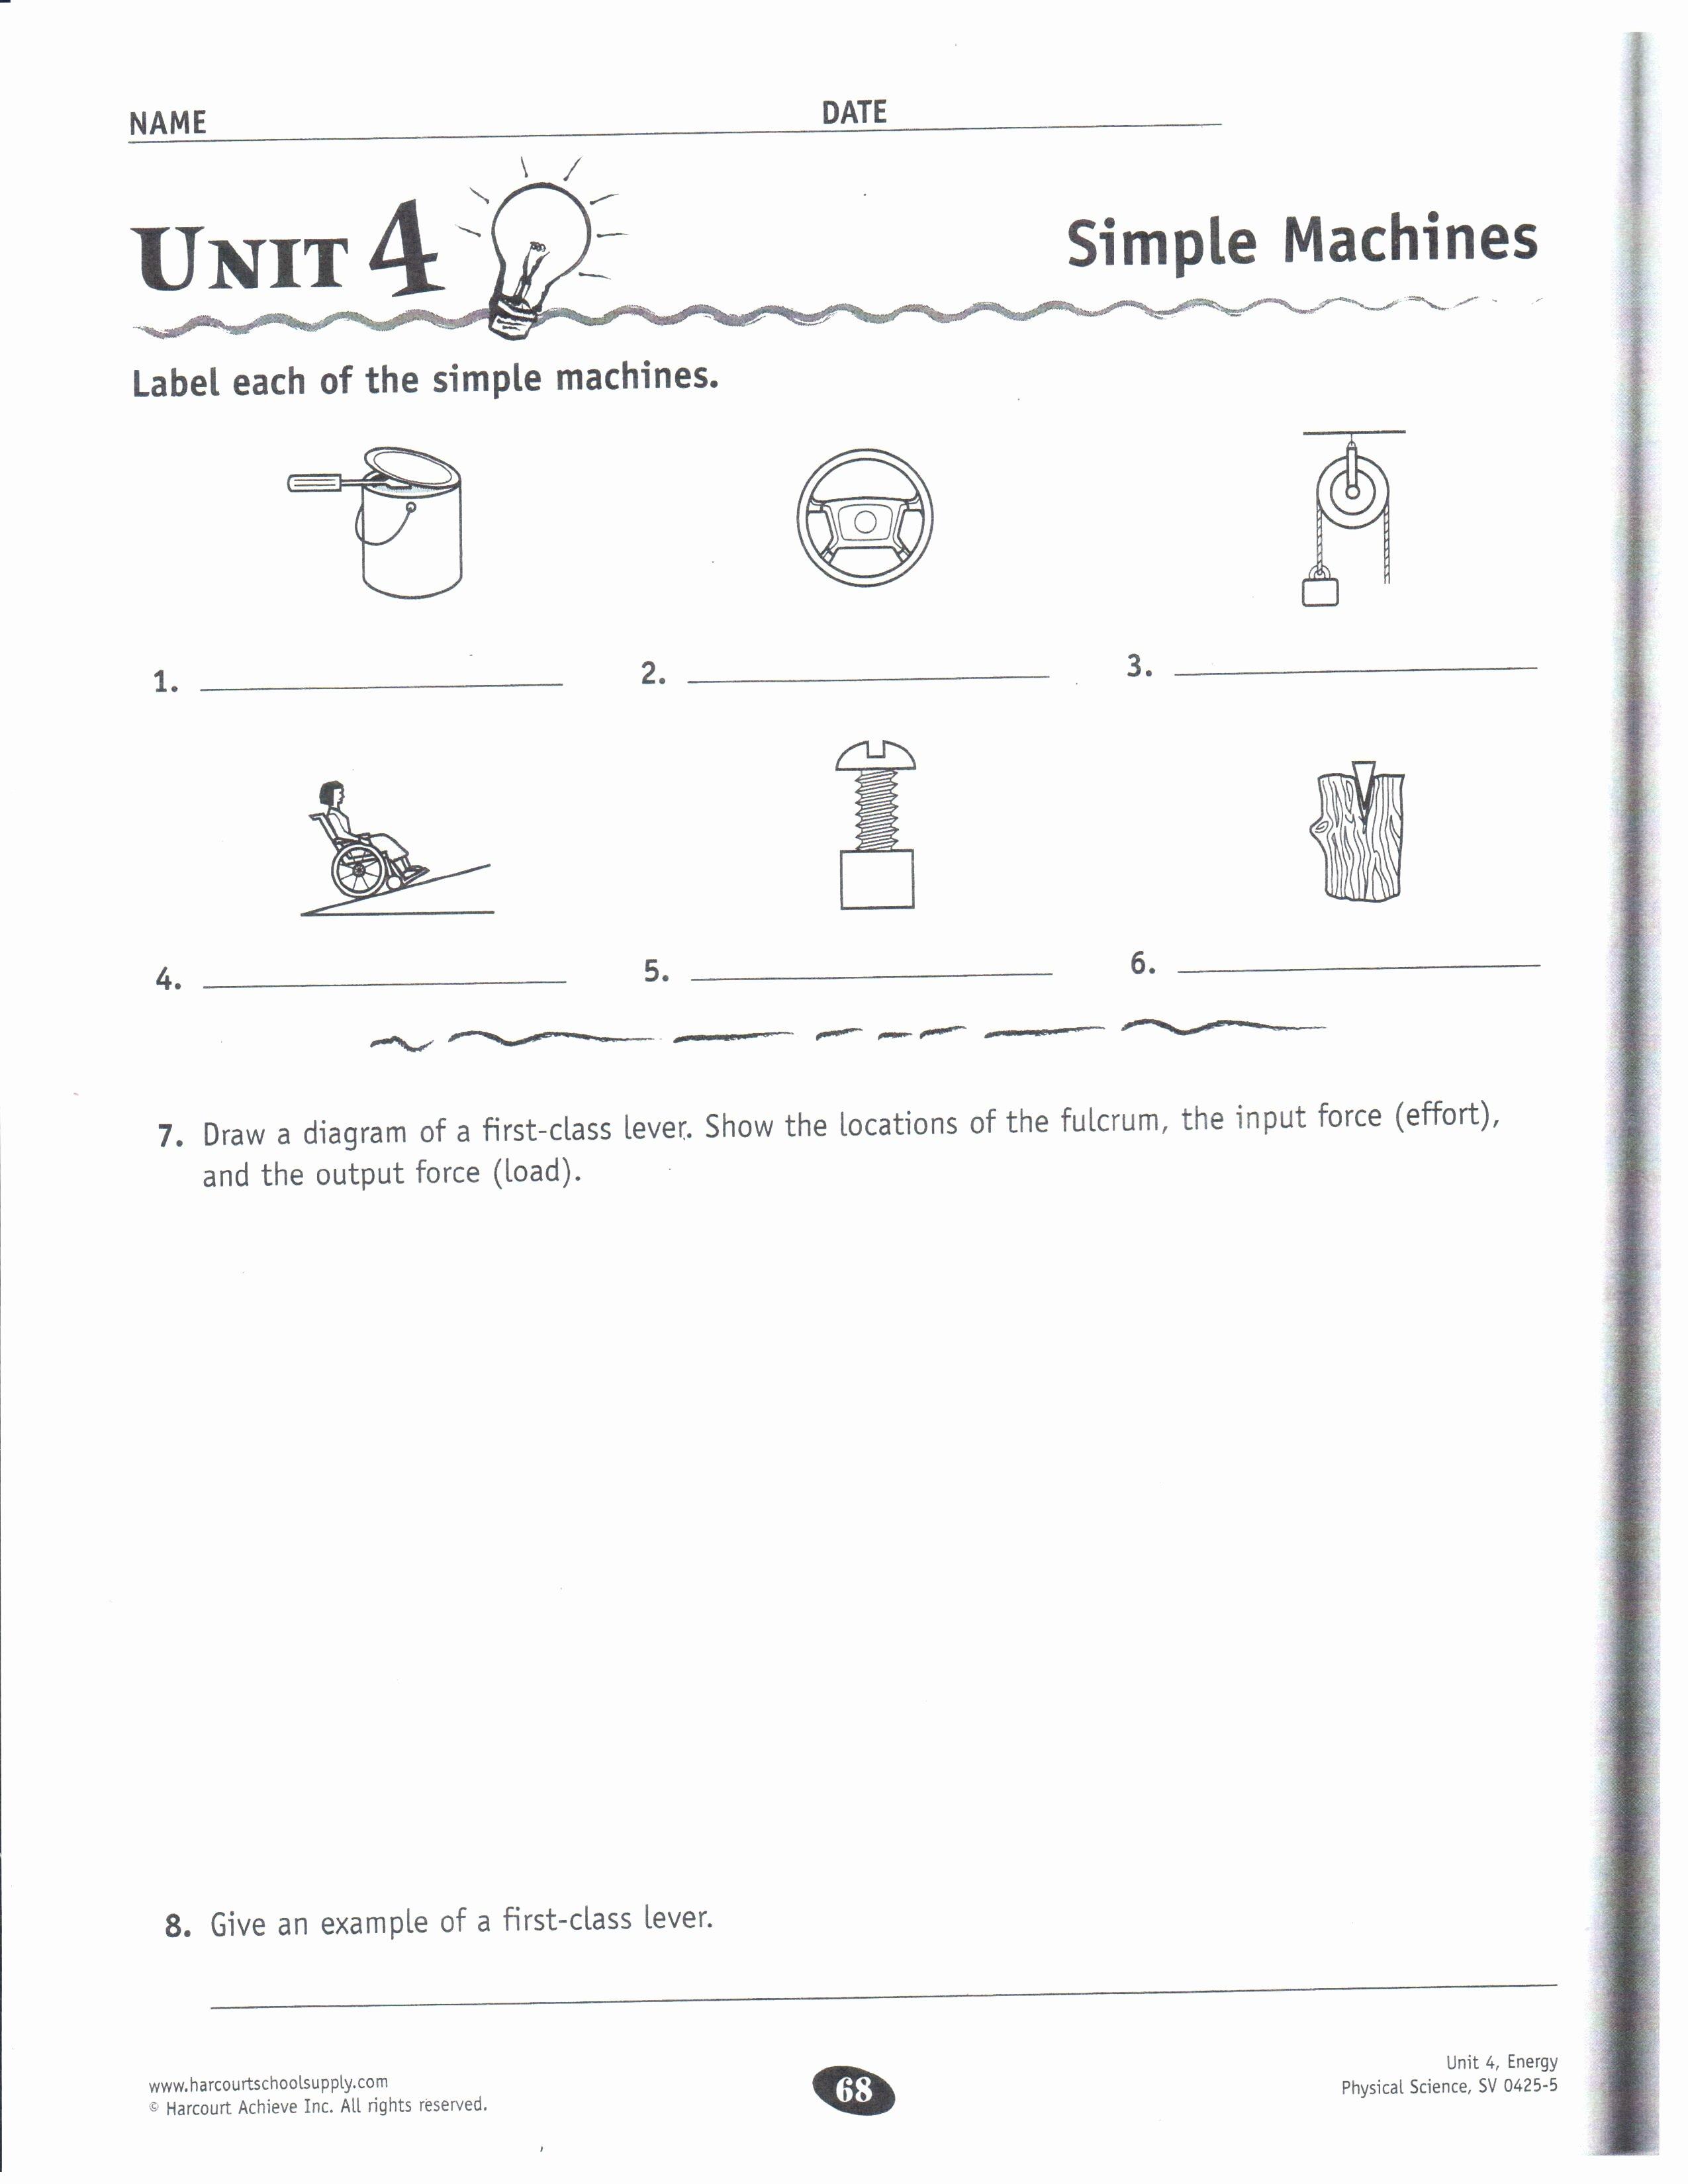 Simple Machines Worksheet Middle School Unique Physical Science Dec 10 14